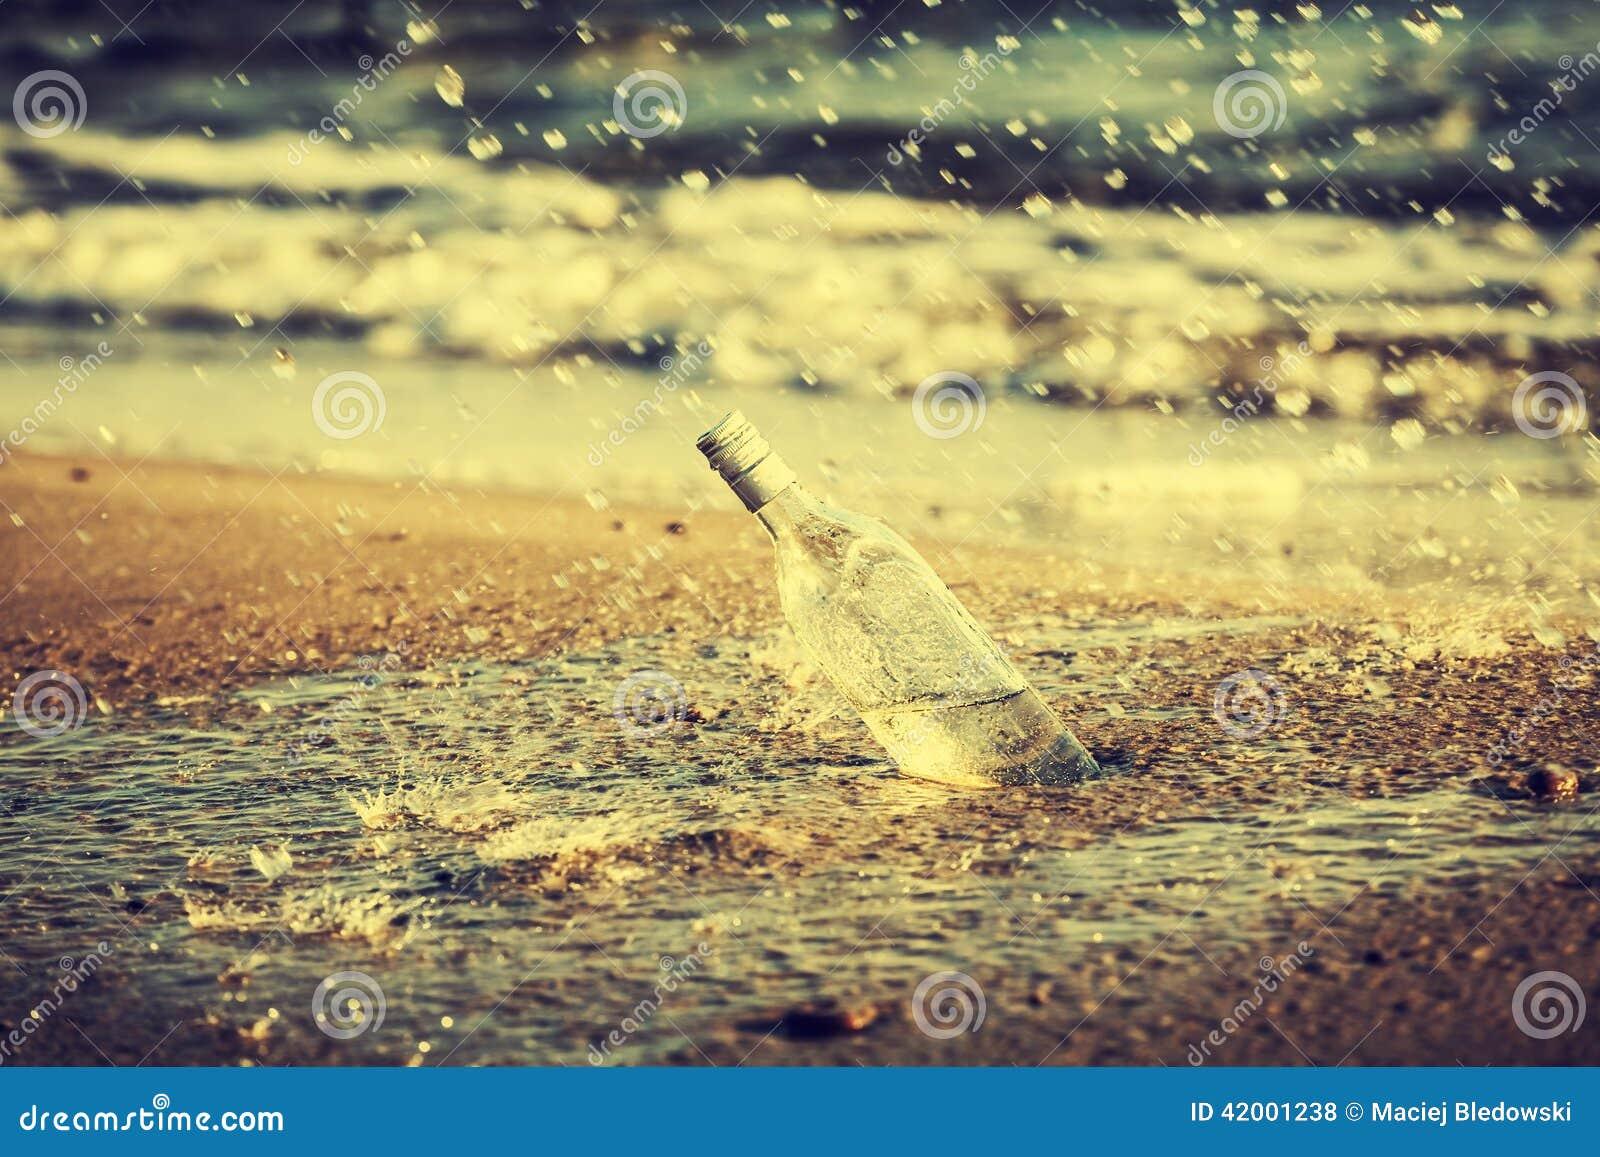 Бутылка с водой падает на пляж, ретро влияние года сбора ...